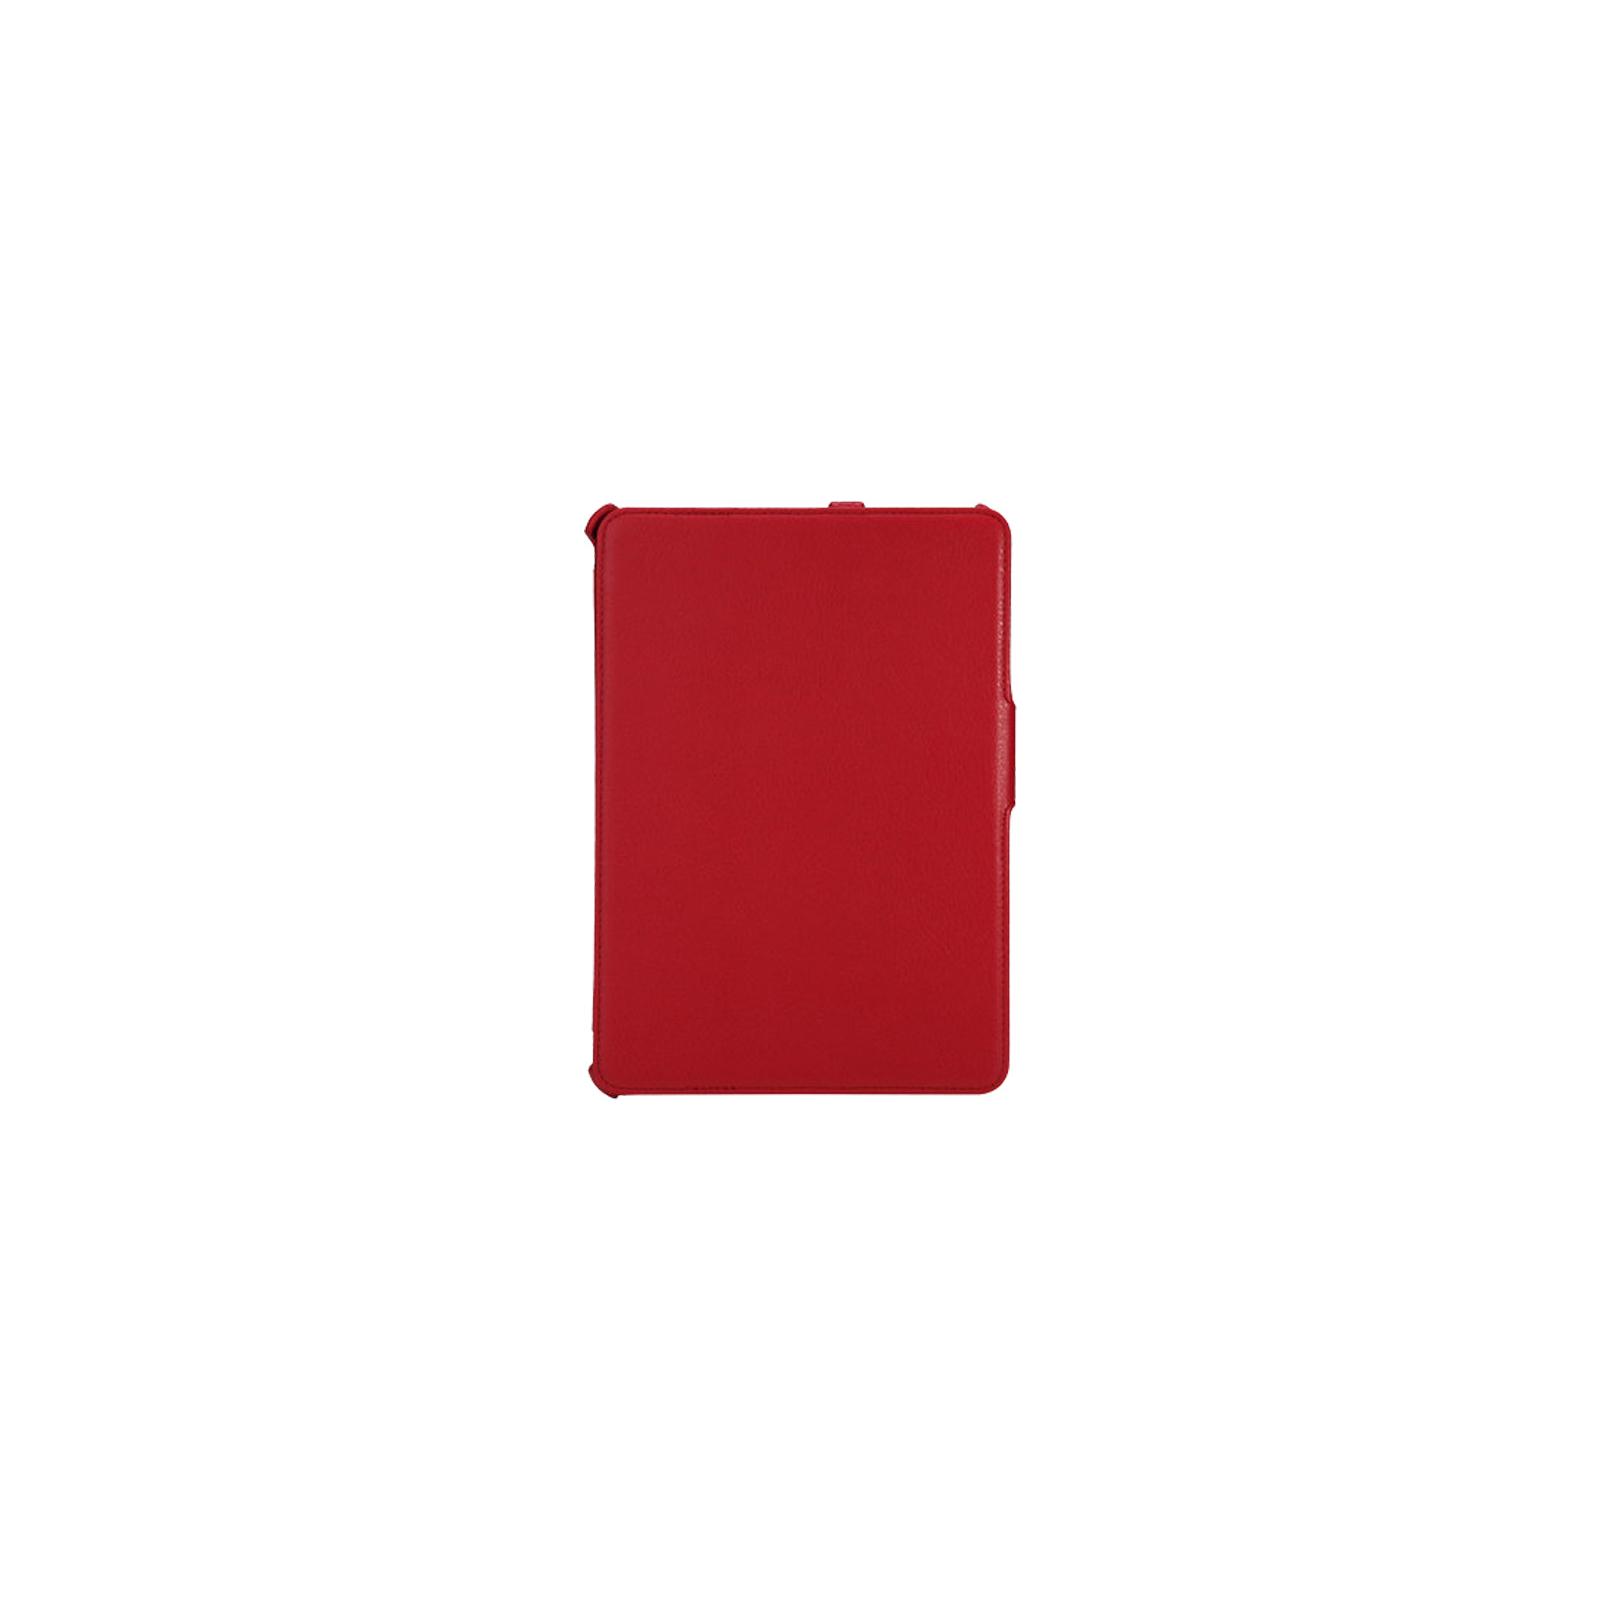 Чехол для планшета AirOn для Samsung Galaxy Tab S 2 9.7 red (4822352777456)